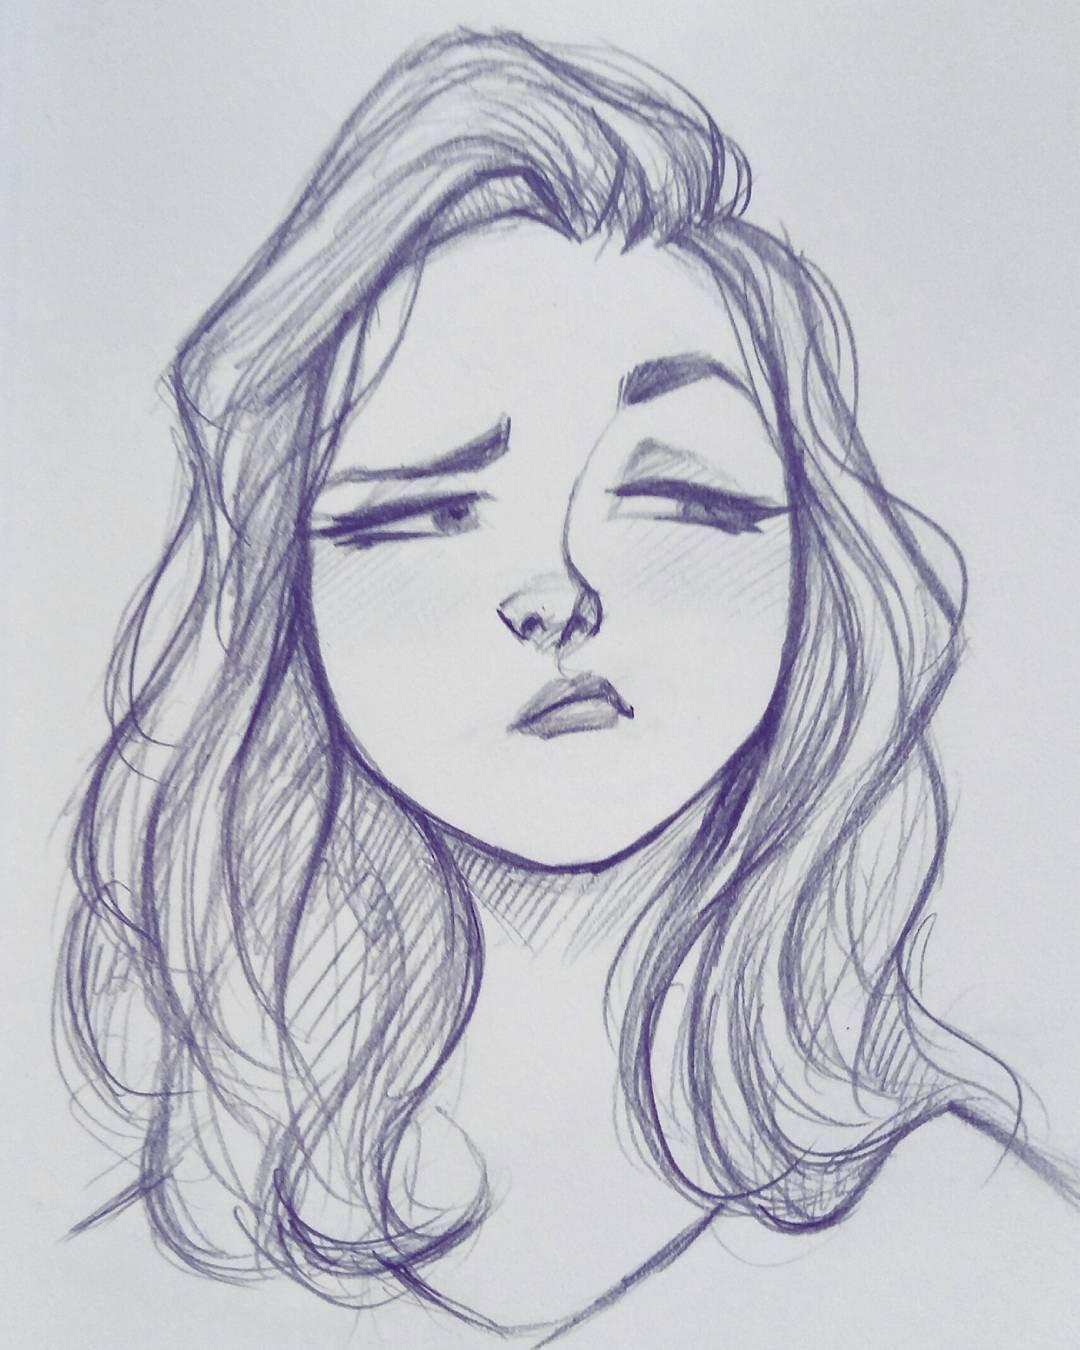 Топ картинки карандашом для срисовки